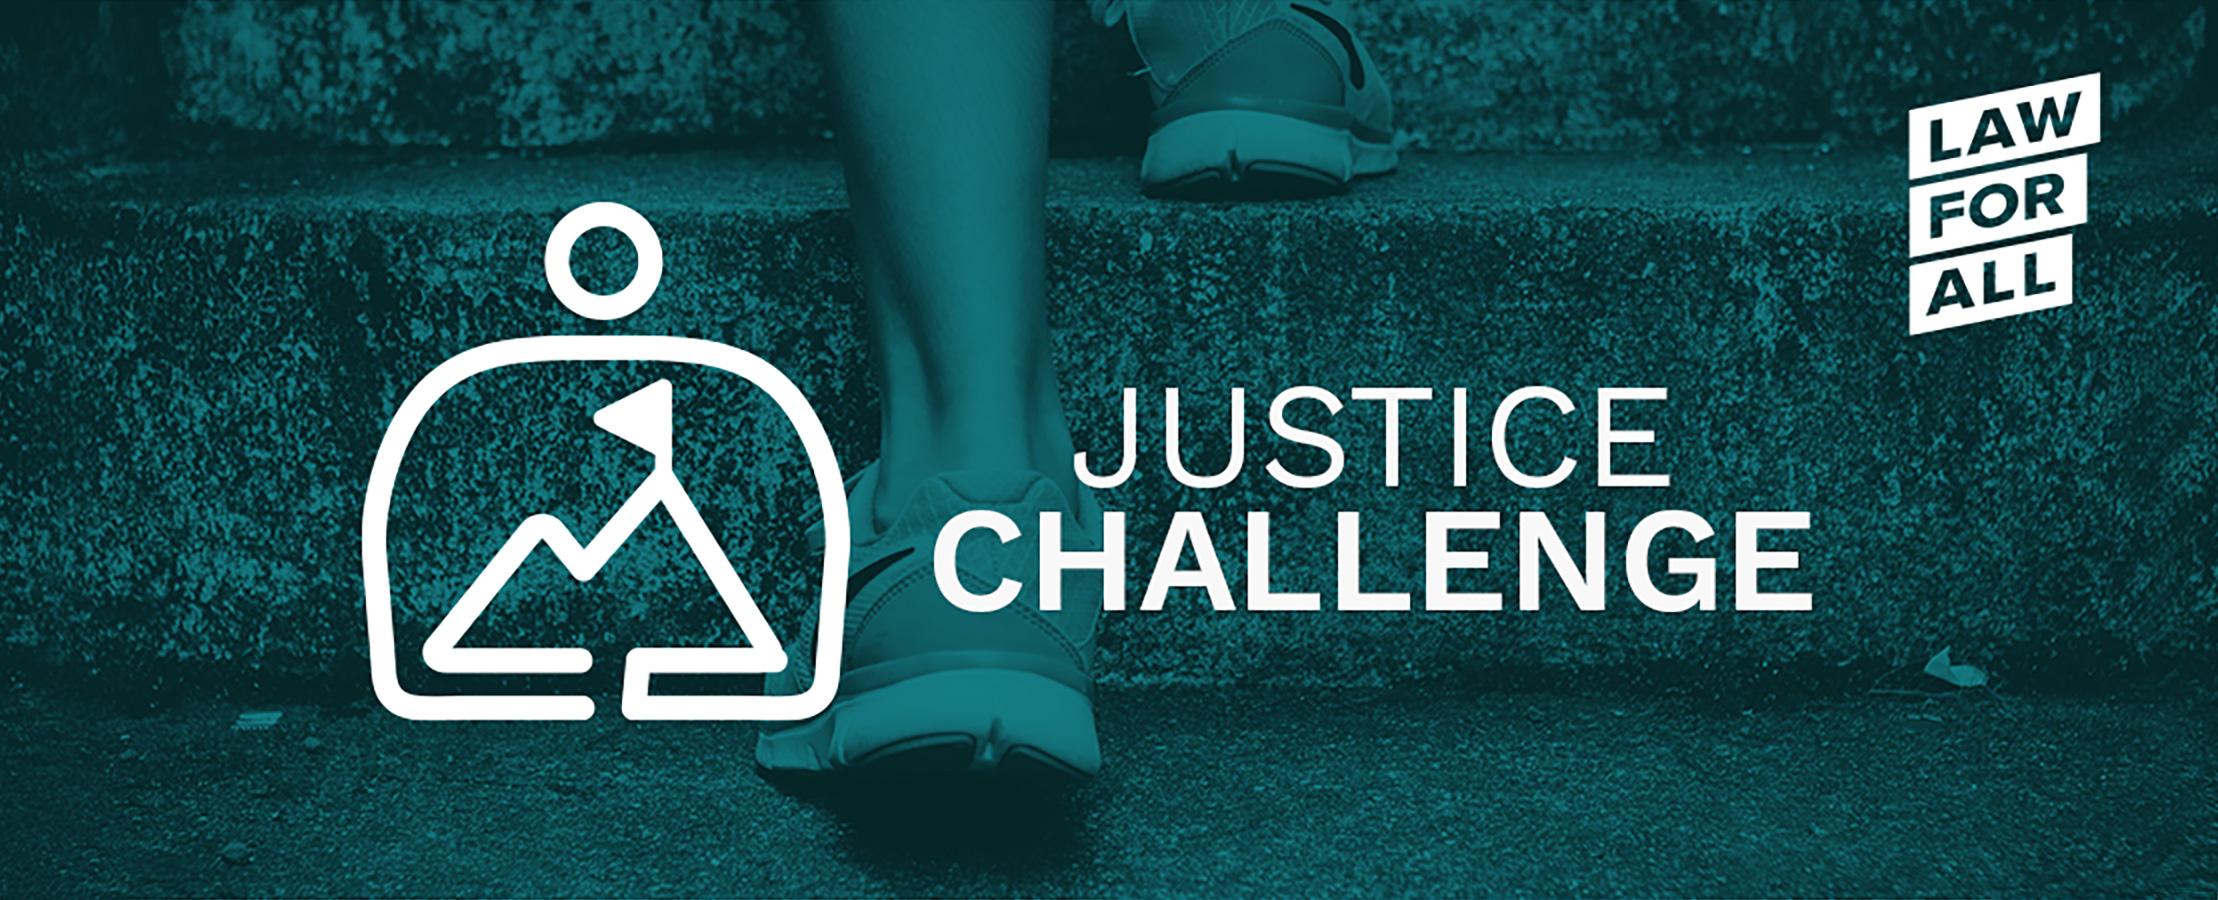 JUSTICE CHALLENGE